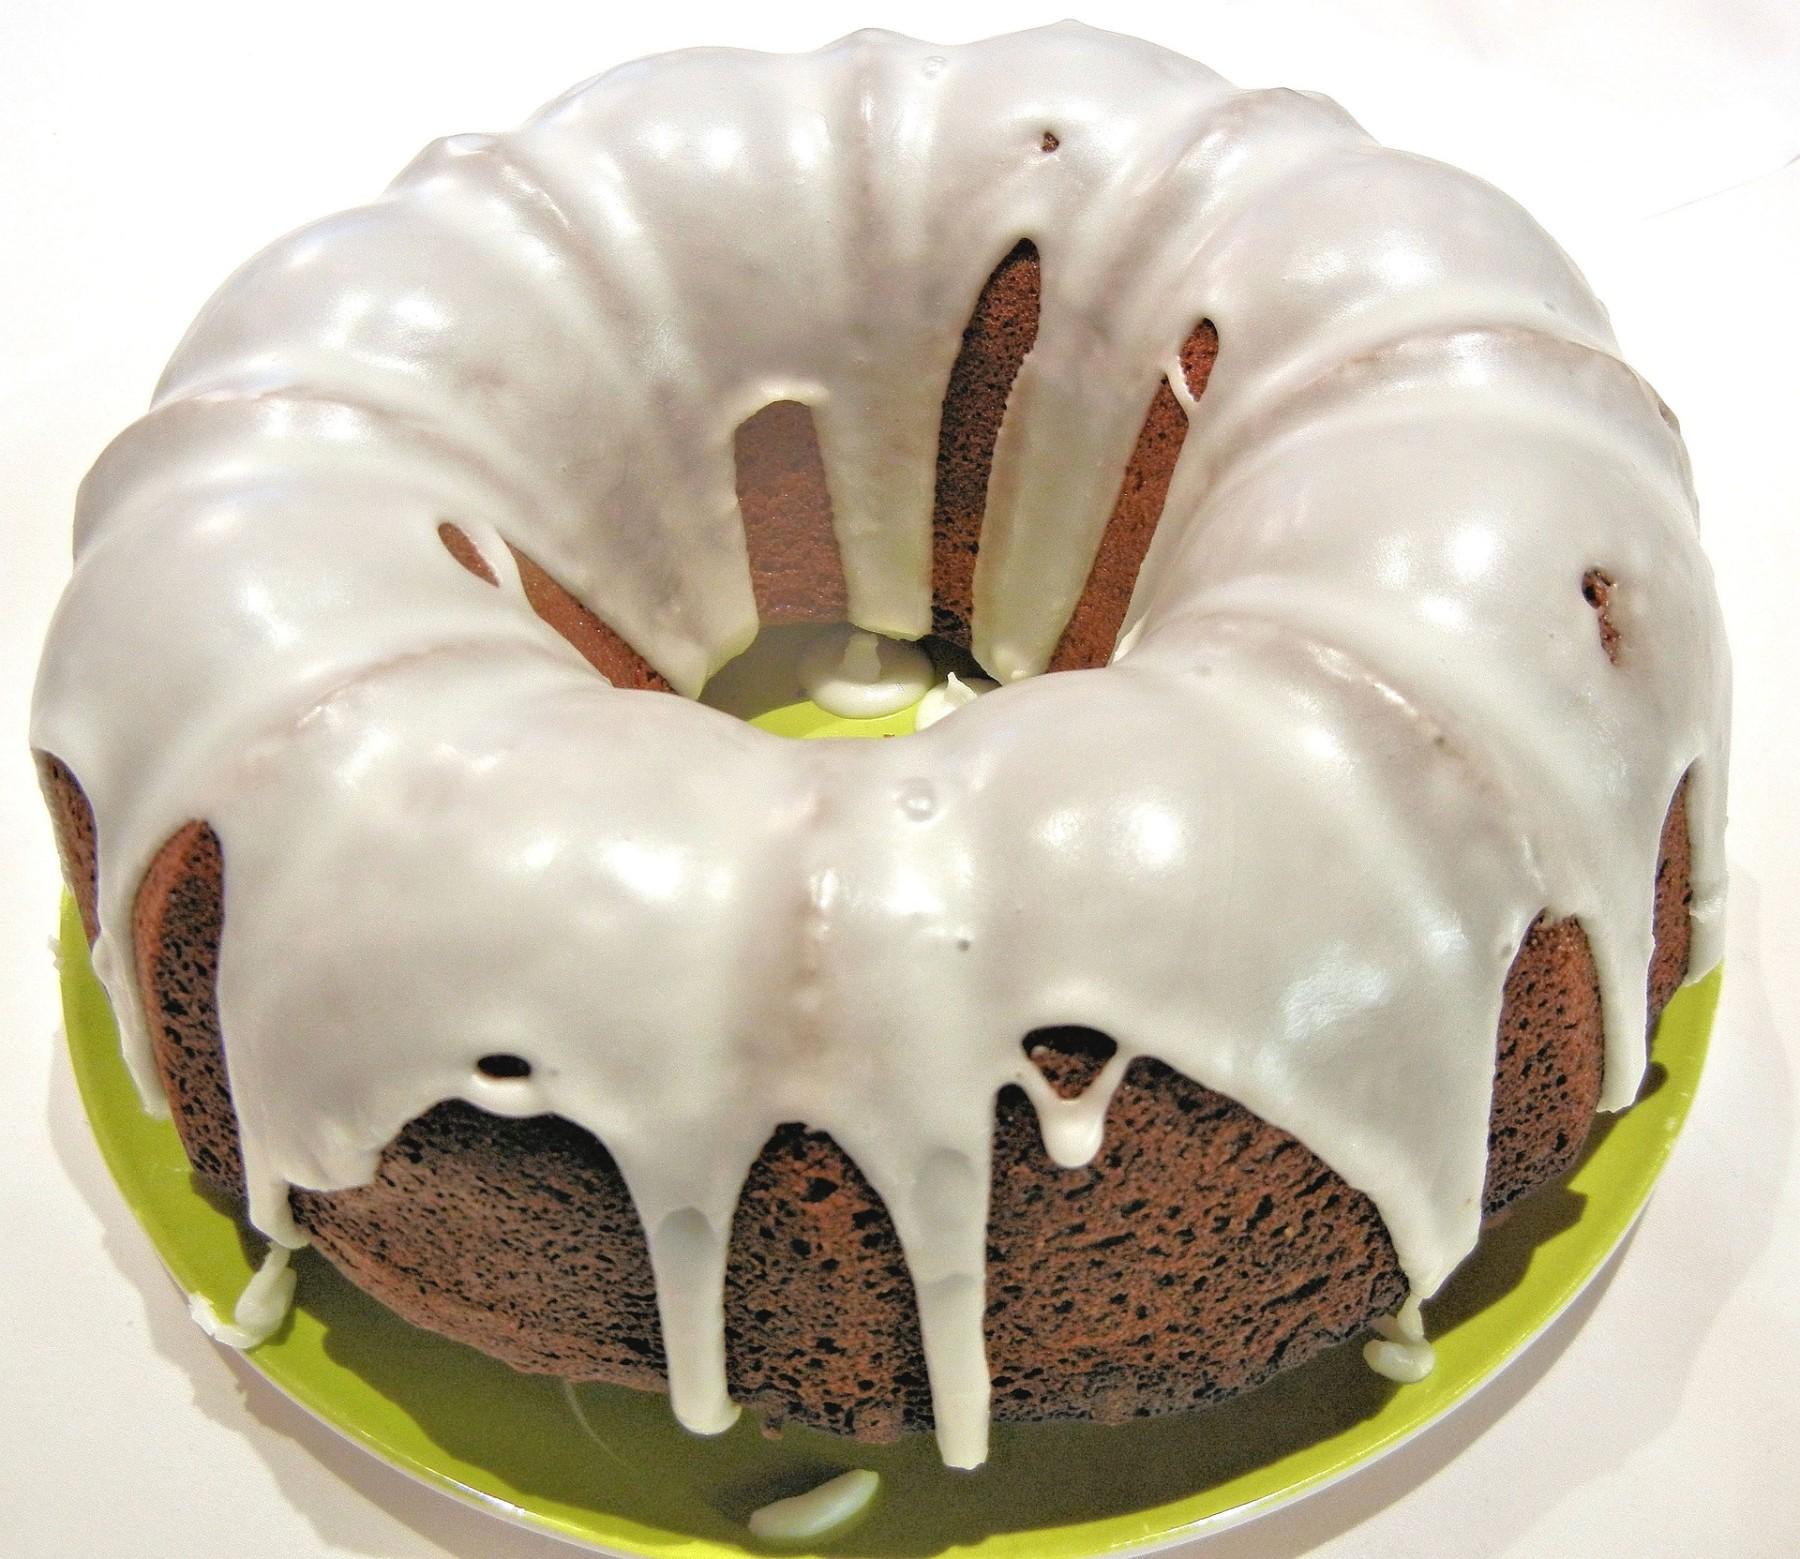 chocolate-bundt-cake-627997_1920